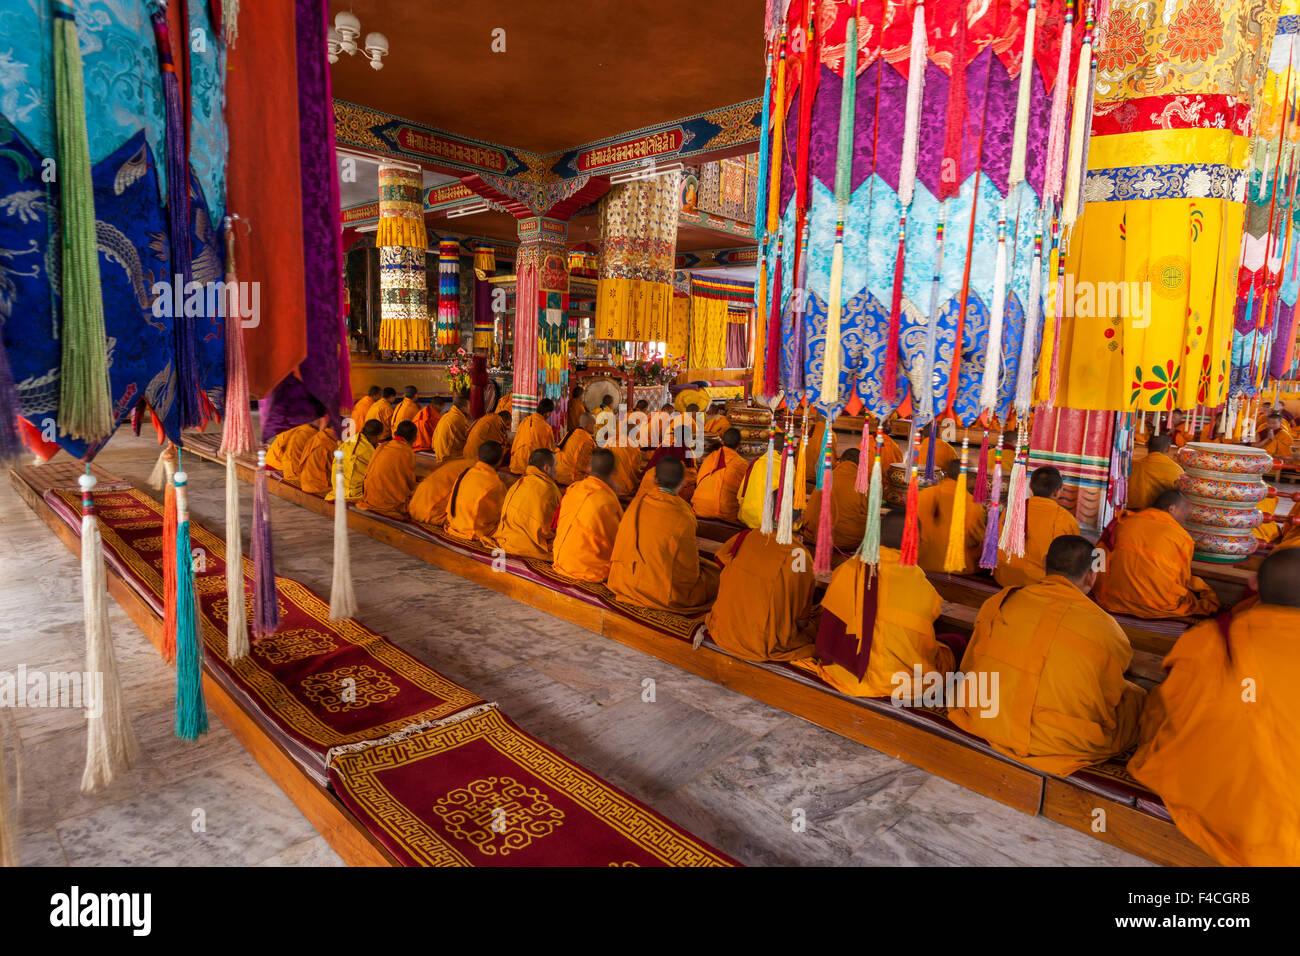 Bhutan, Jakar, Monks chanting. - Stock Image